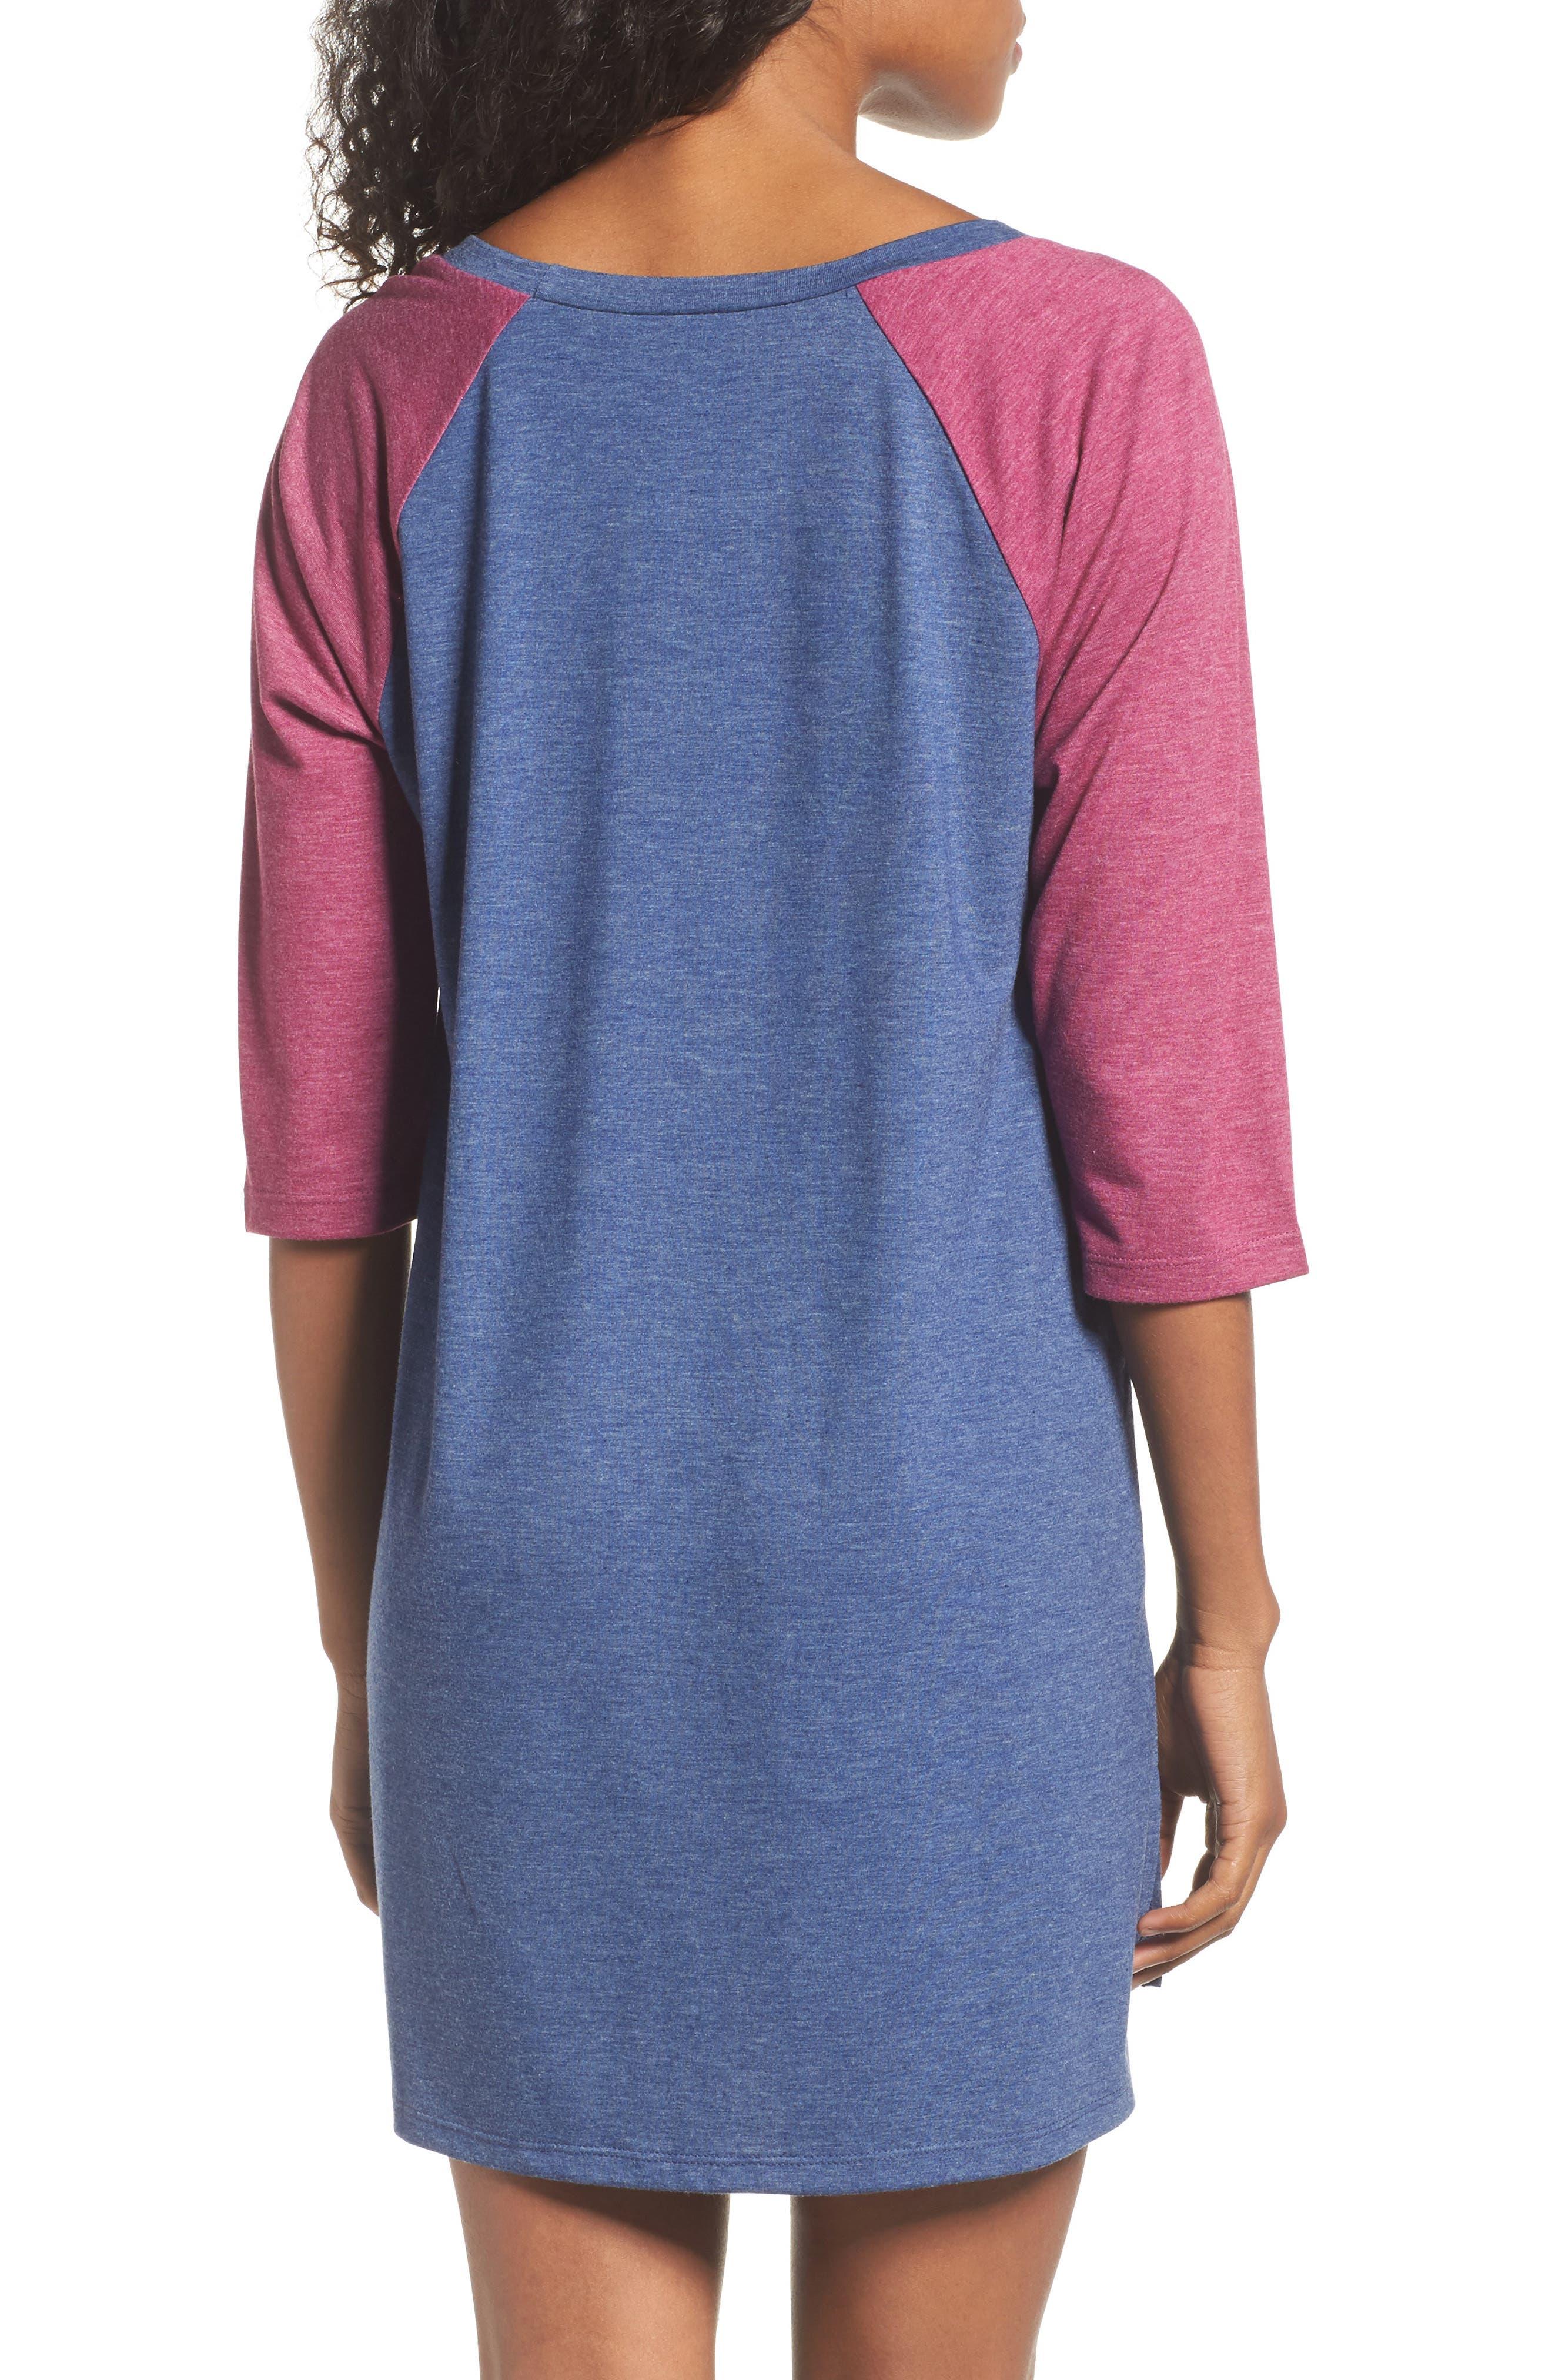 Honeydew All American Sleep Shirt,                             Alternate thumbnail 12, color,